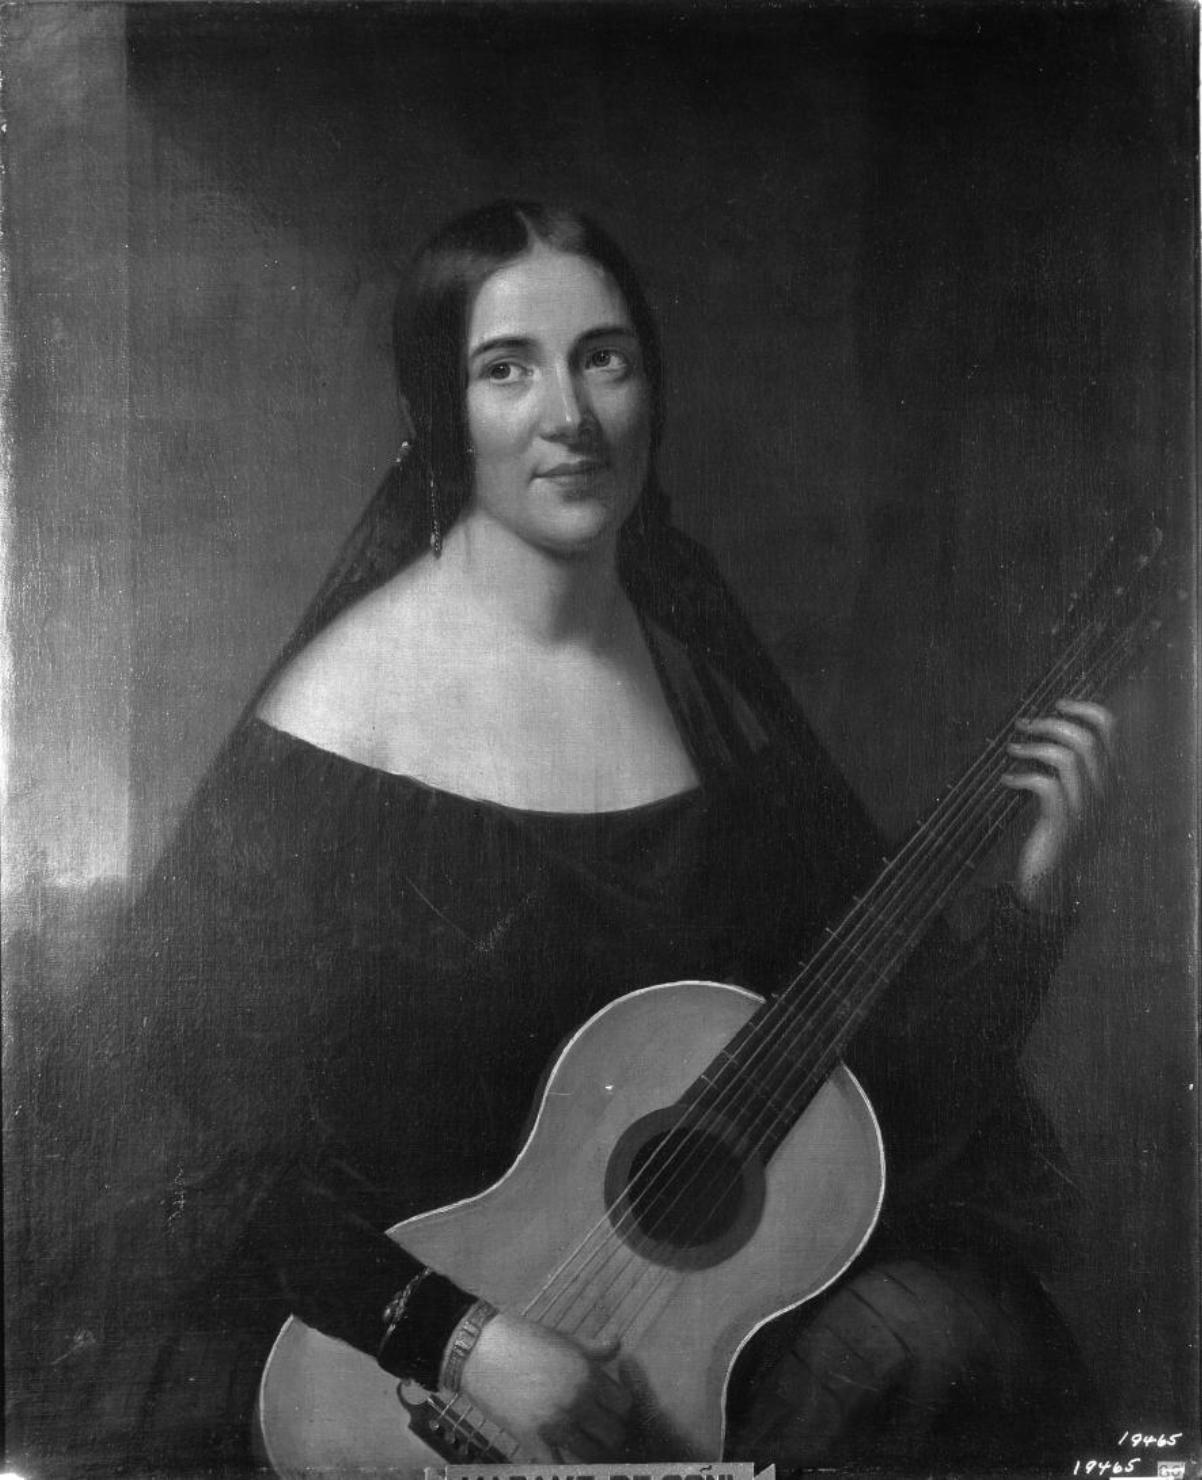 Maria Dolores Esturias y Navarres aka Madame De Goni [A.G. Powers, via Frick Collection]